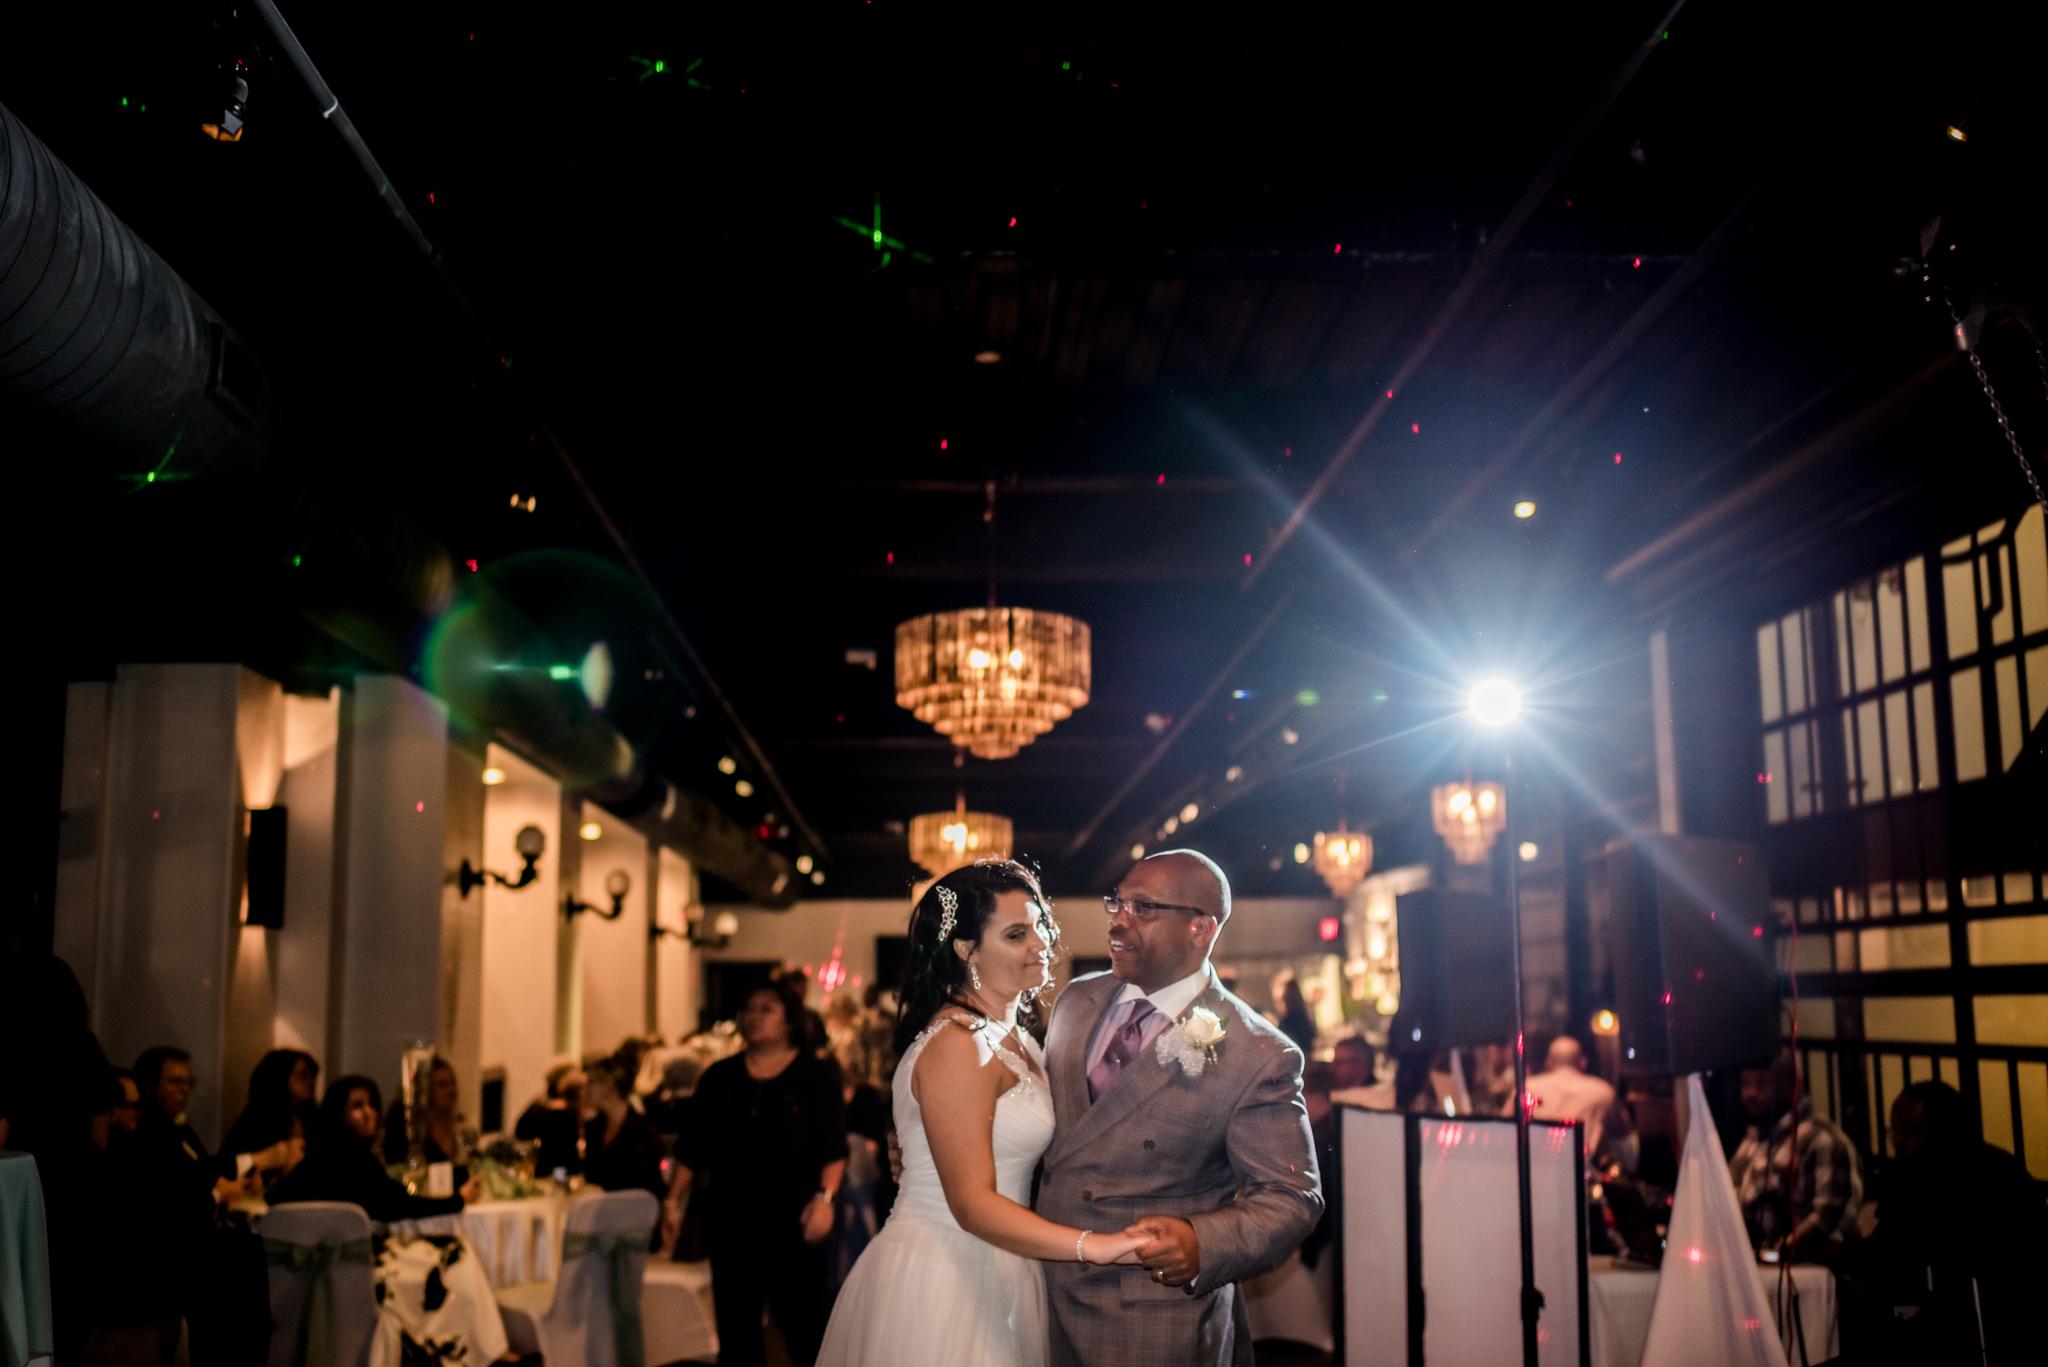 gibsonville-wedding-photography-029.jpg